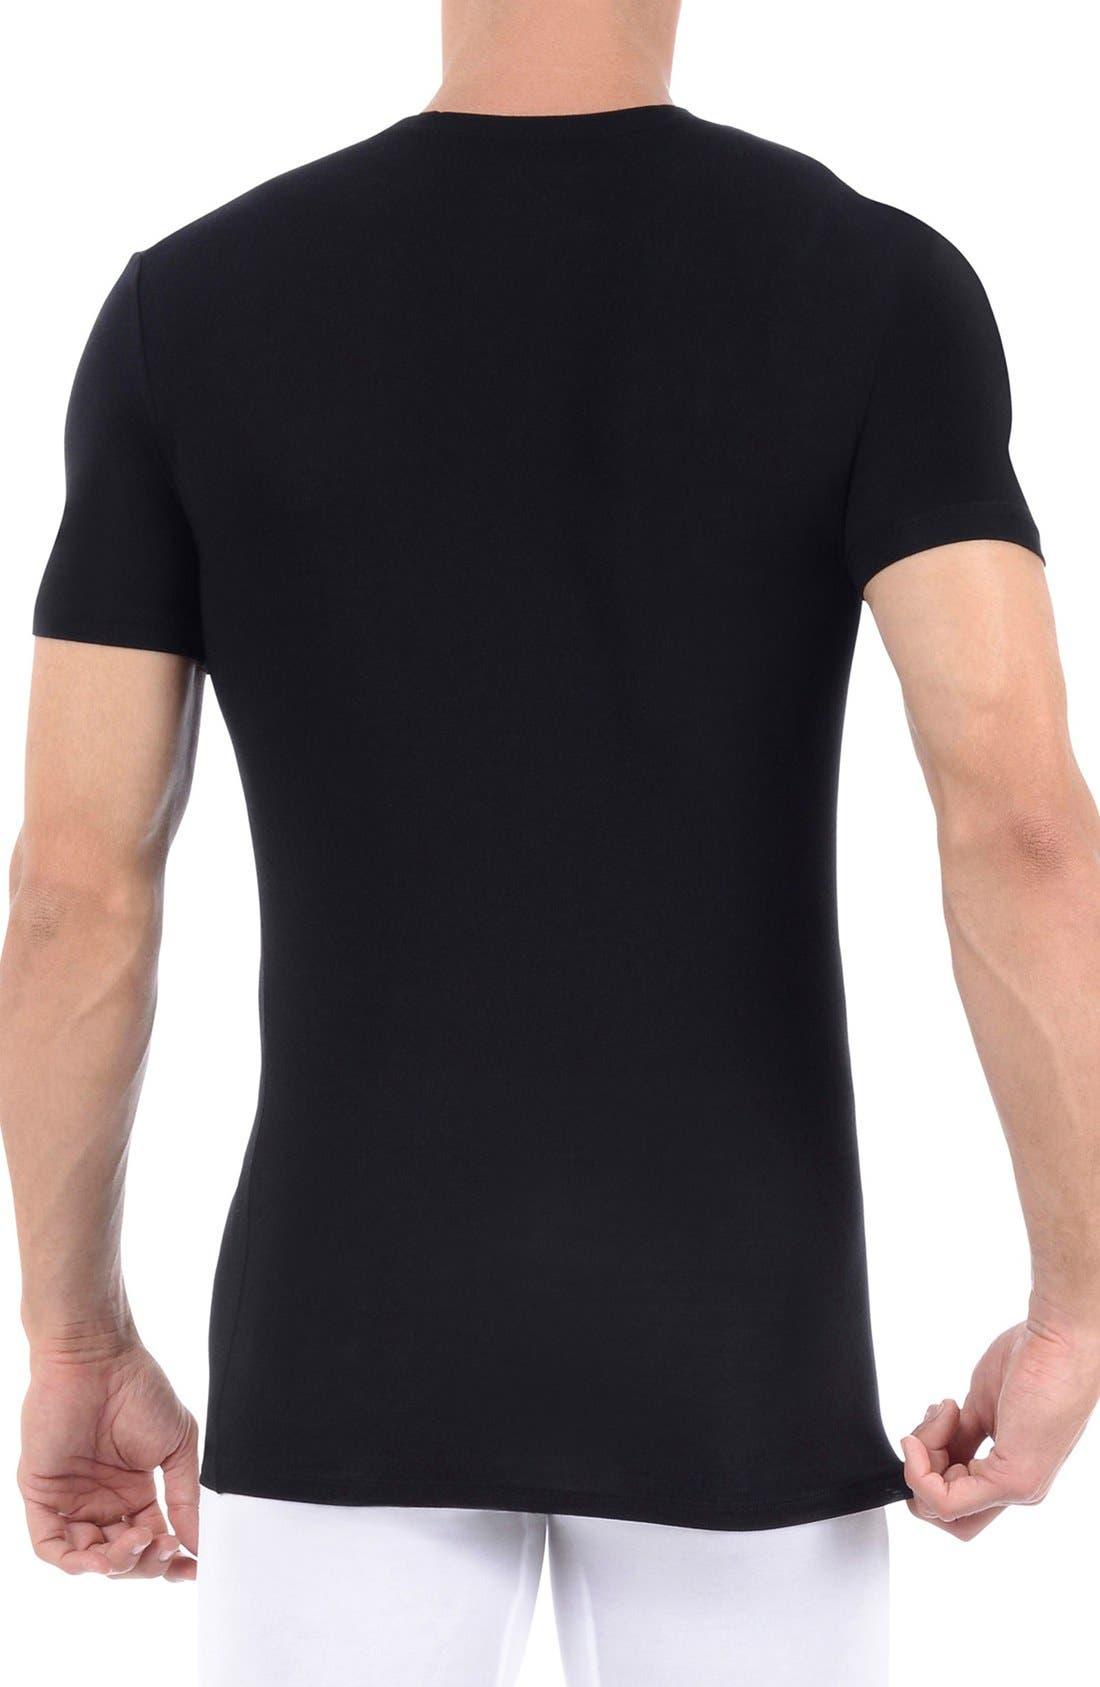 Alternate Image 2  - Tommy John 'Cool Cotton' Crewneck Undershirt